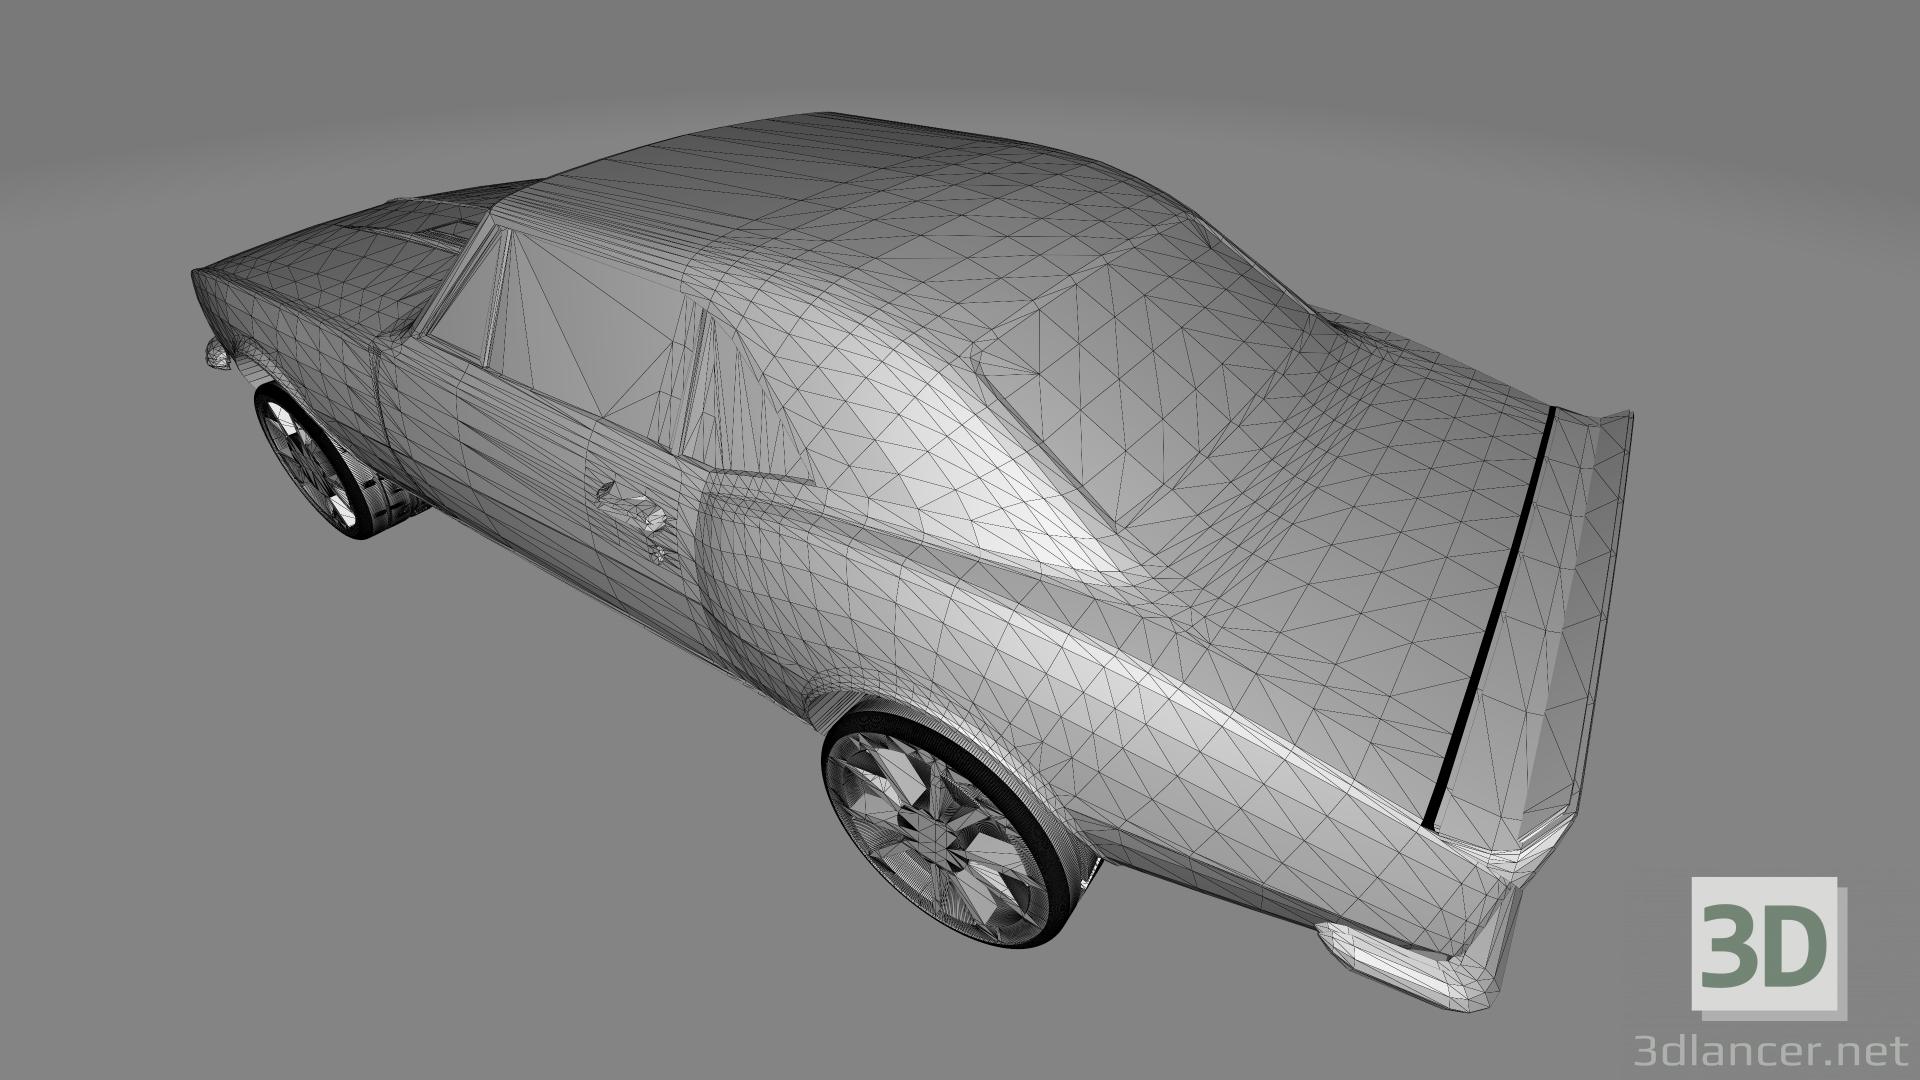 3d Chevrolet Camaro SS 67 - Printable toy model buy - render